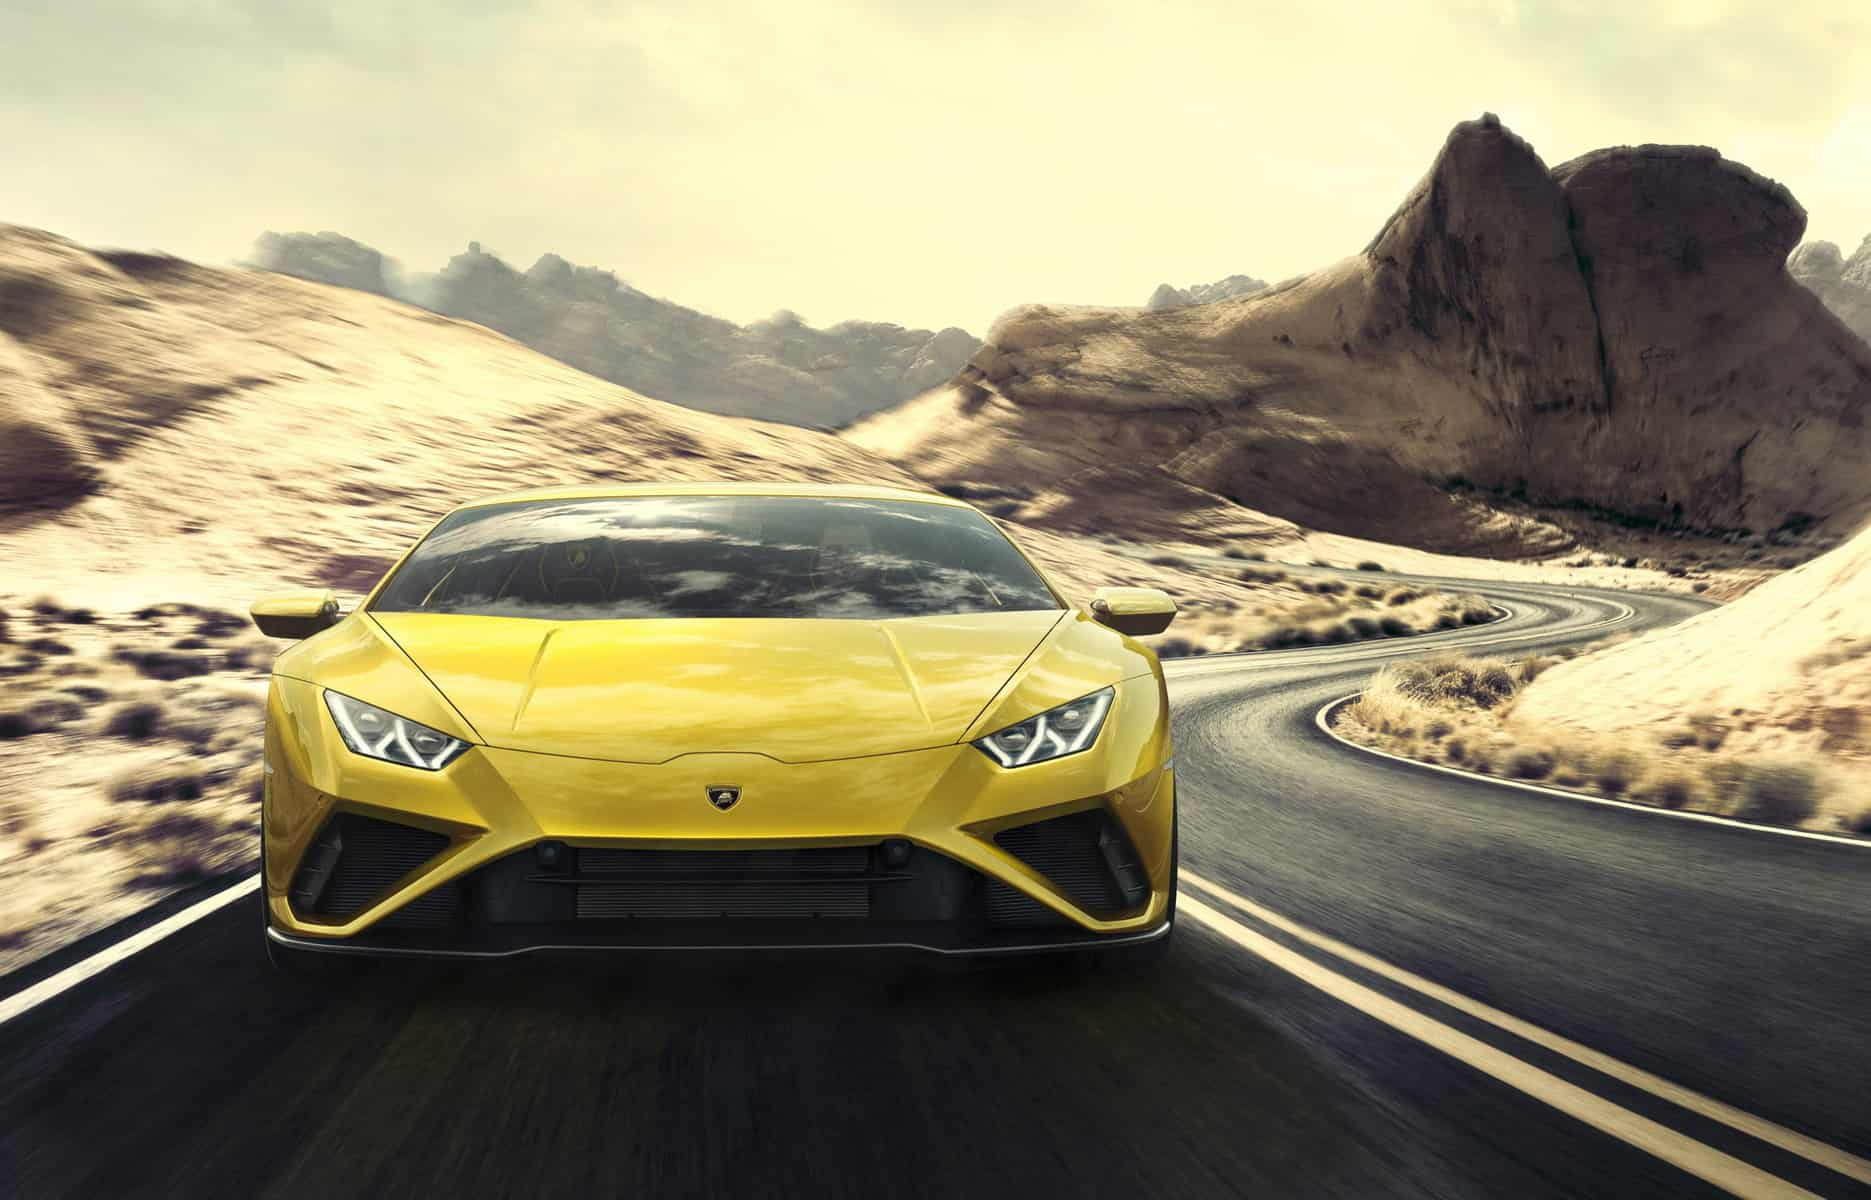 Lamborghini Huracan EVO Rear-Wheel Drive 3